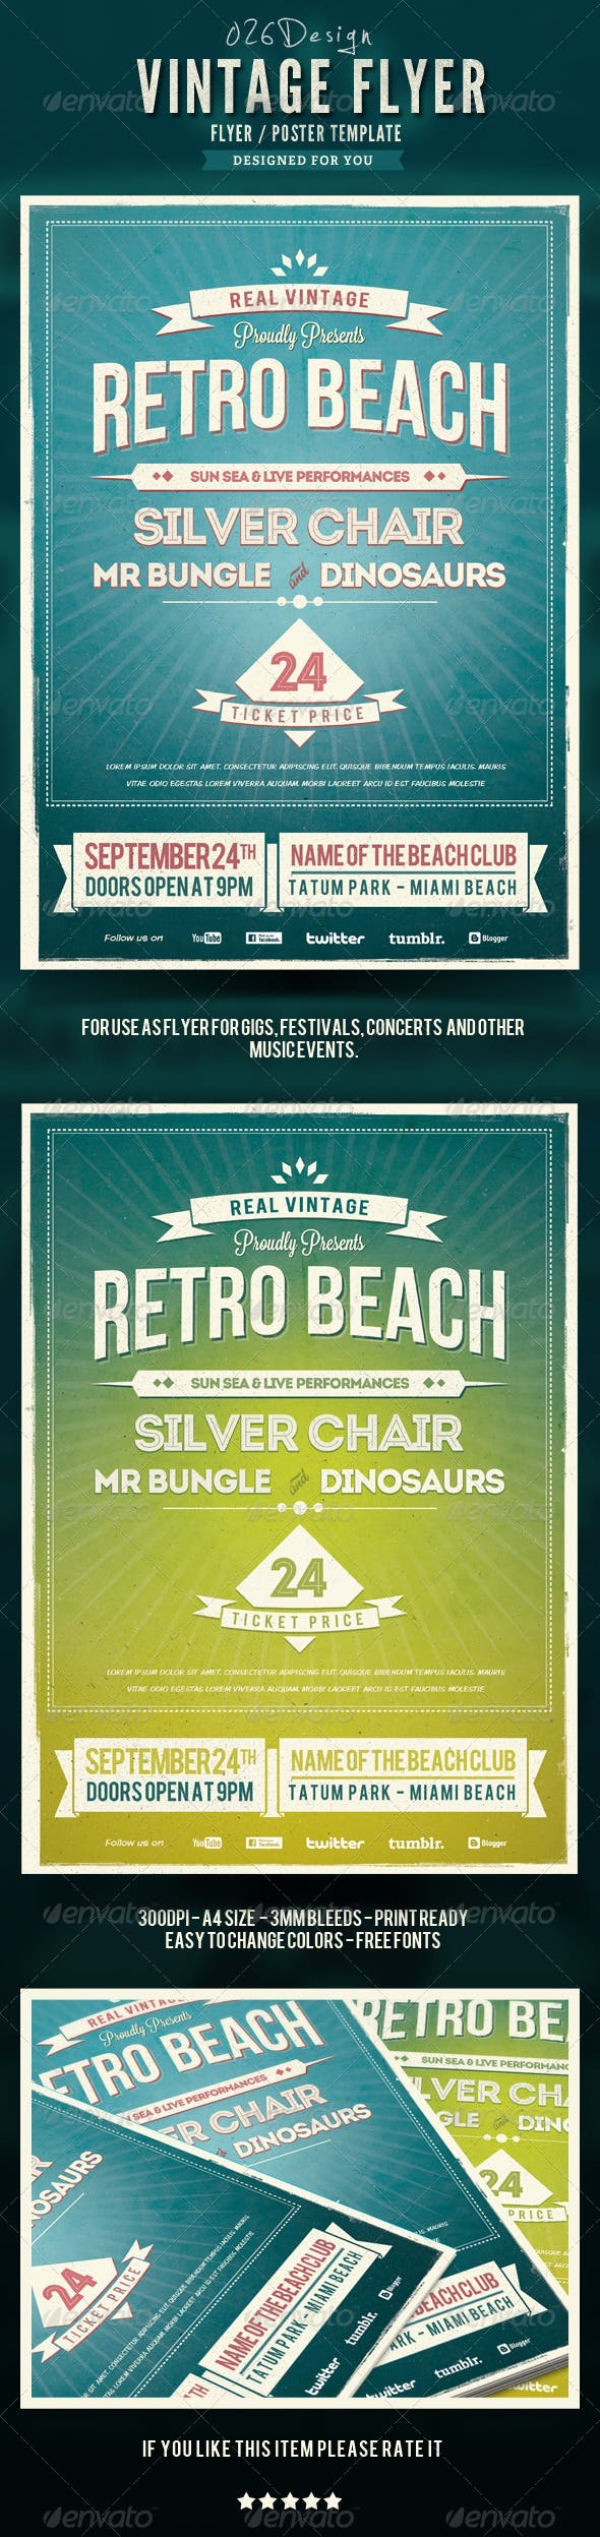 retro beach flyer